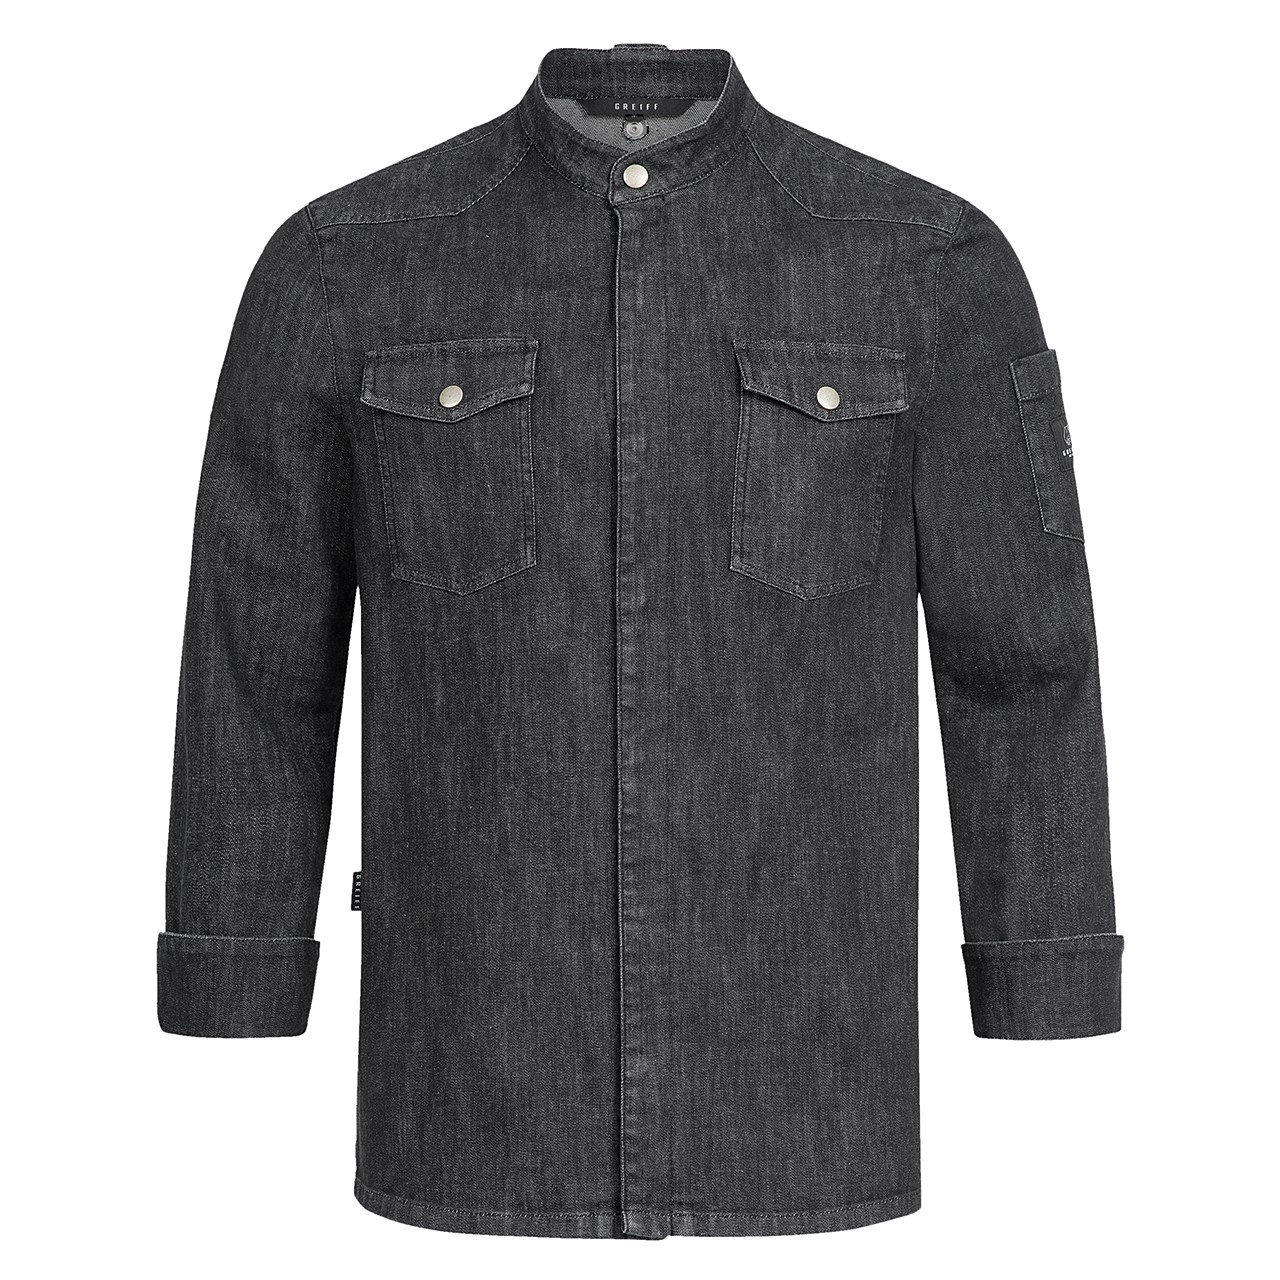 Premium Kochjacke Black Denim Greiff® | bedrucken, besticken, bedrucken lassen, besticken lassen, mit Logo |